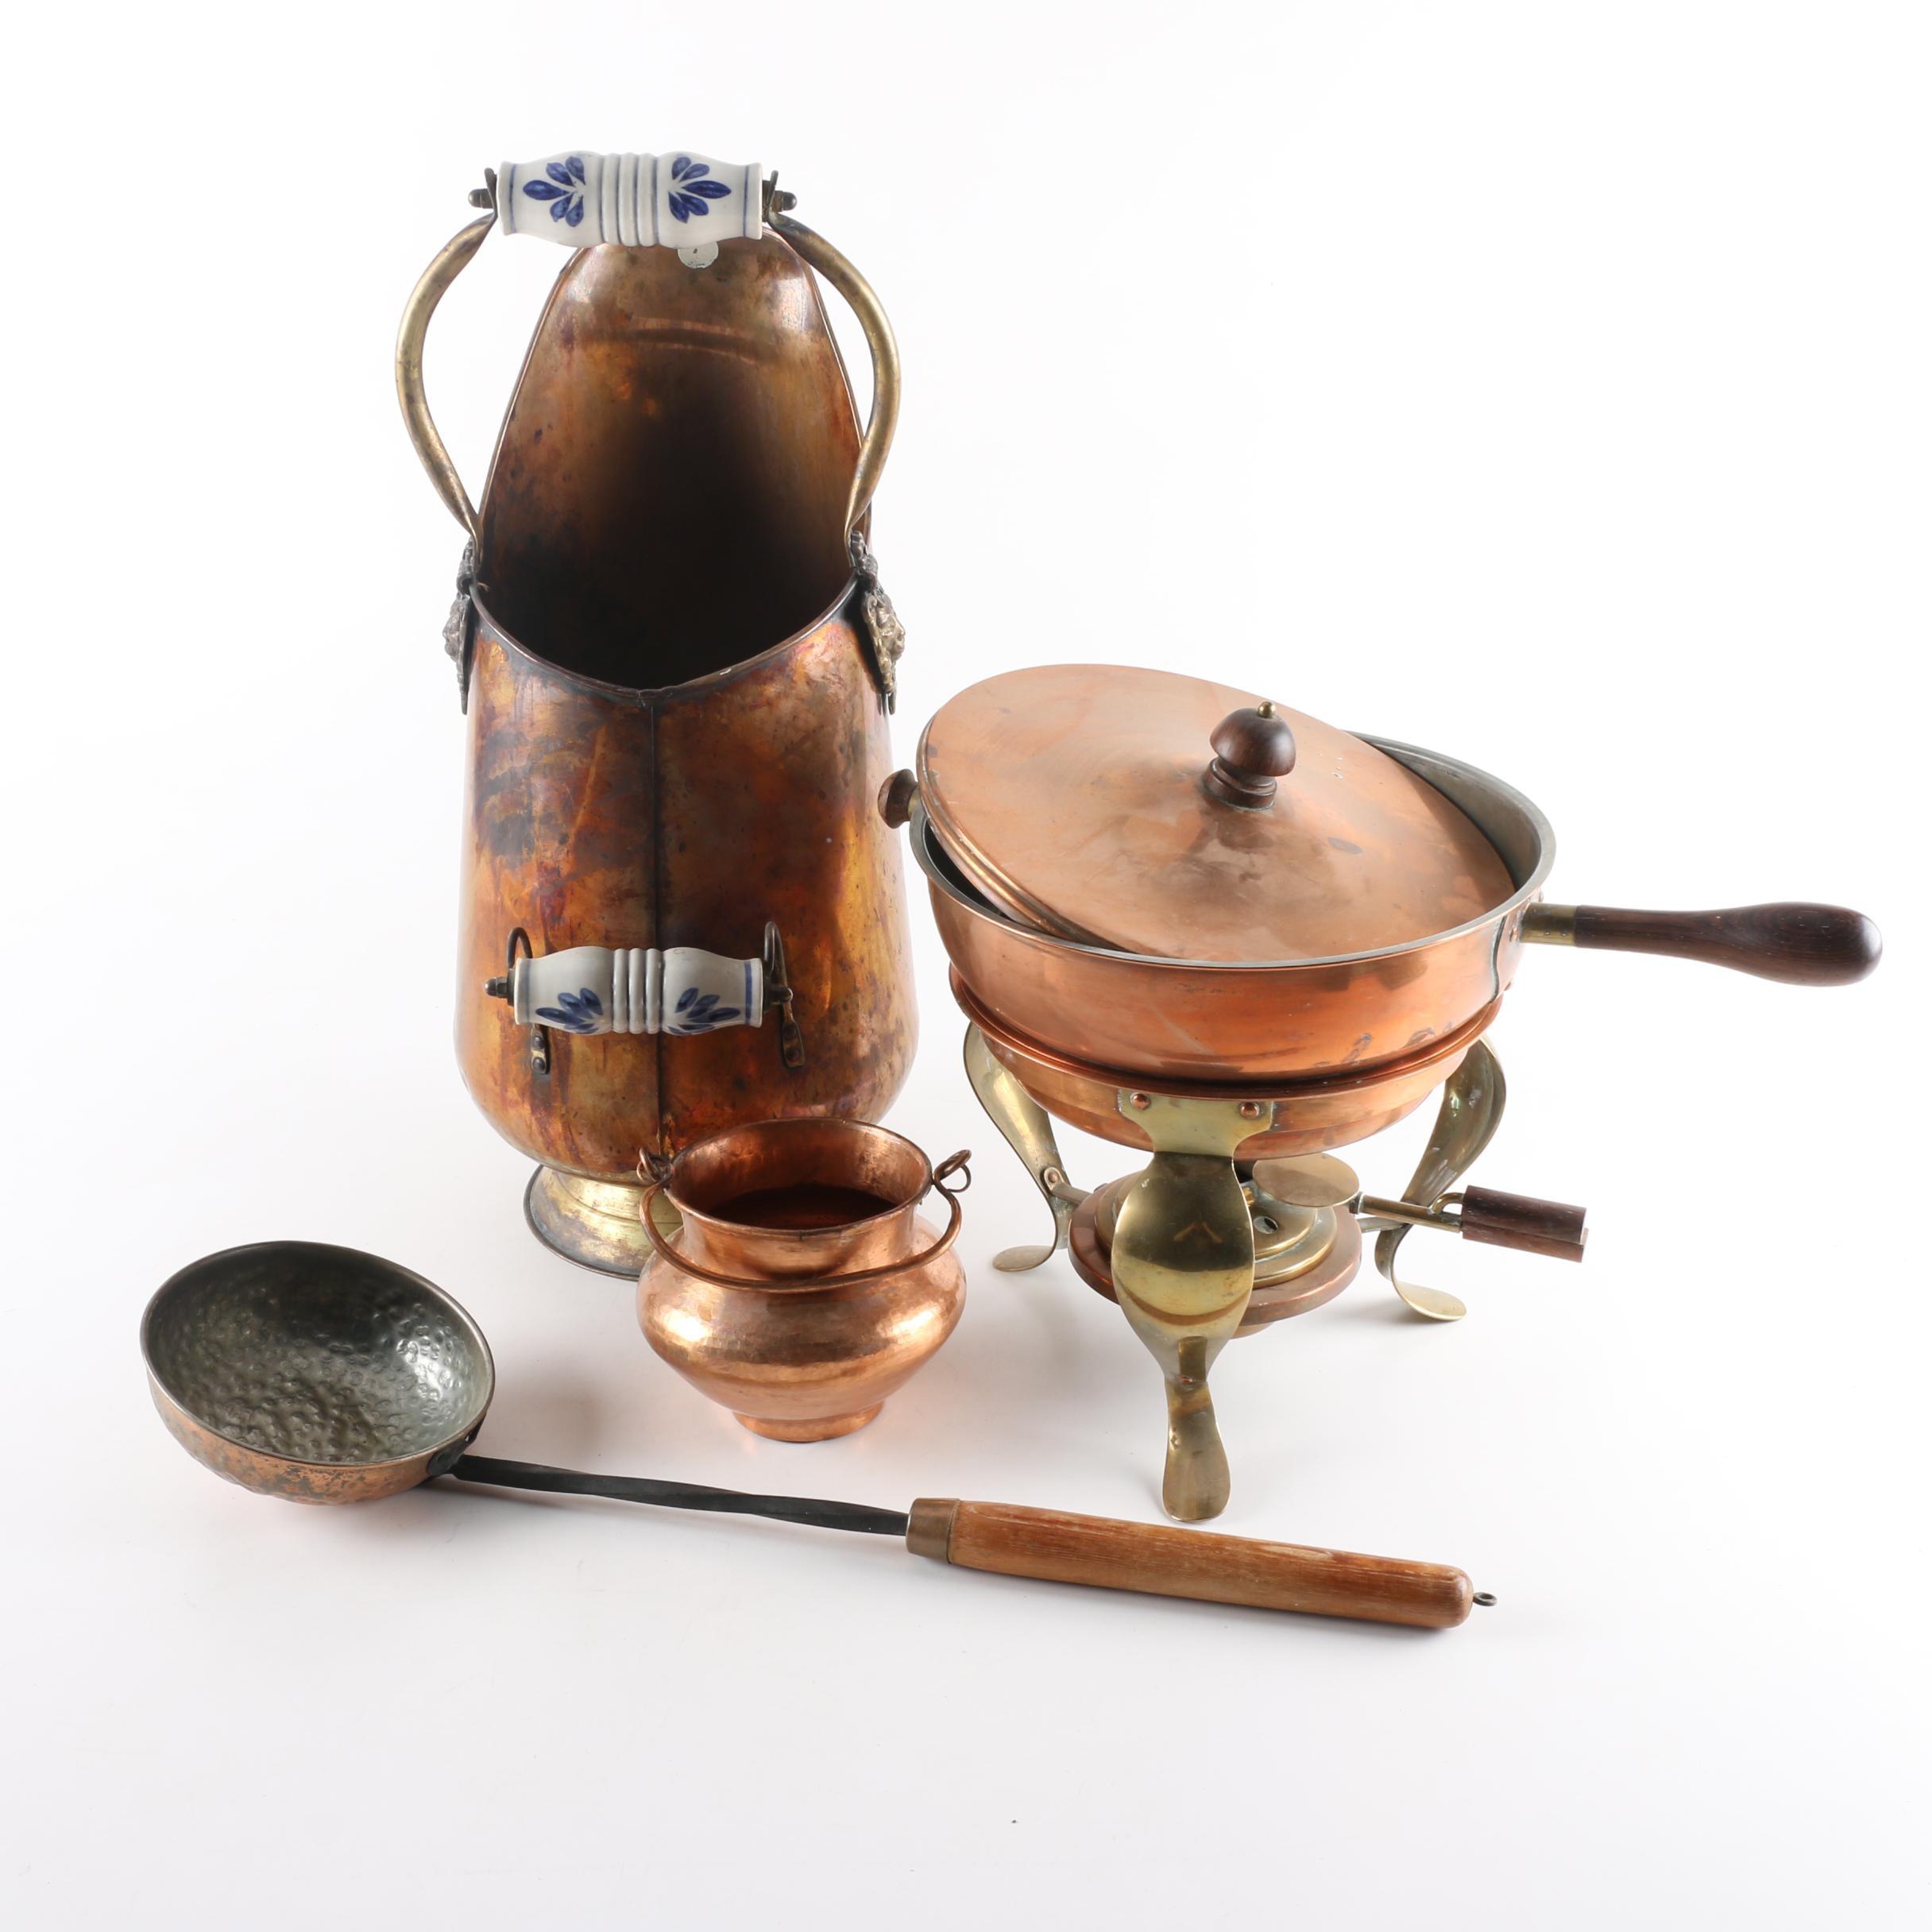 Decorative Copper Coal Bucket and More